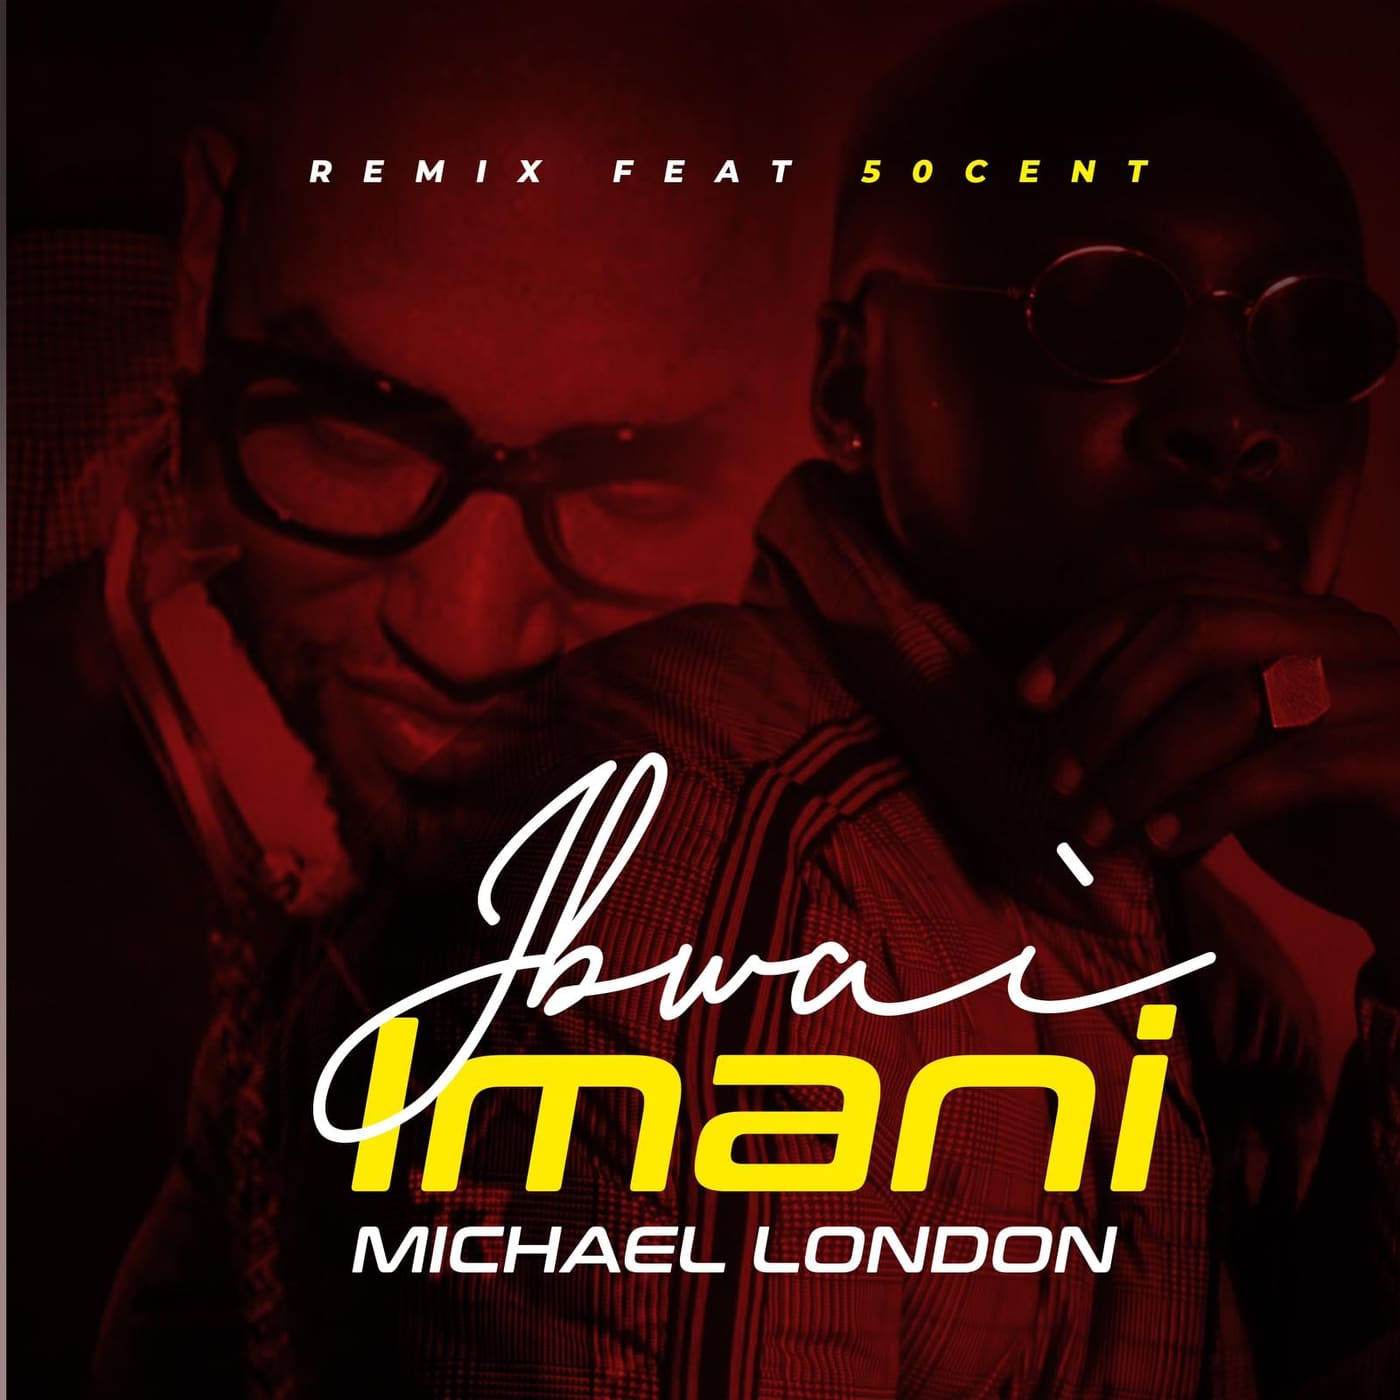 Imani remix ft 50cent